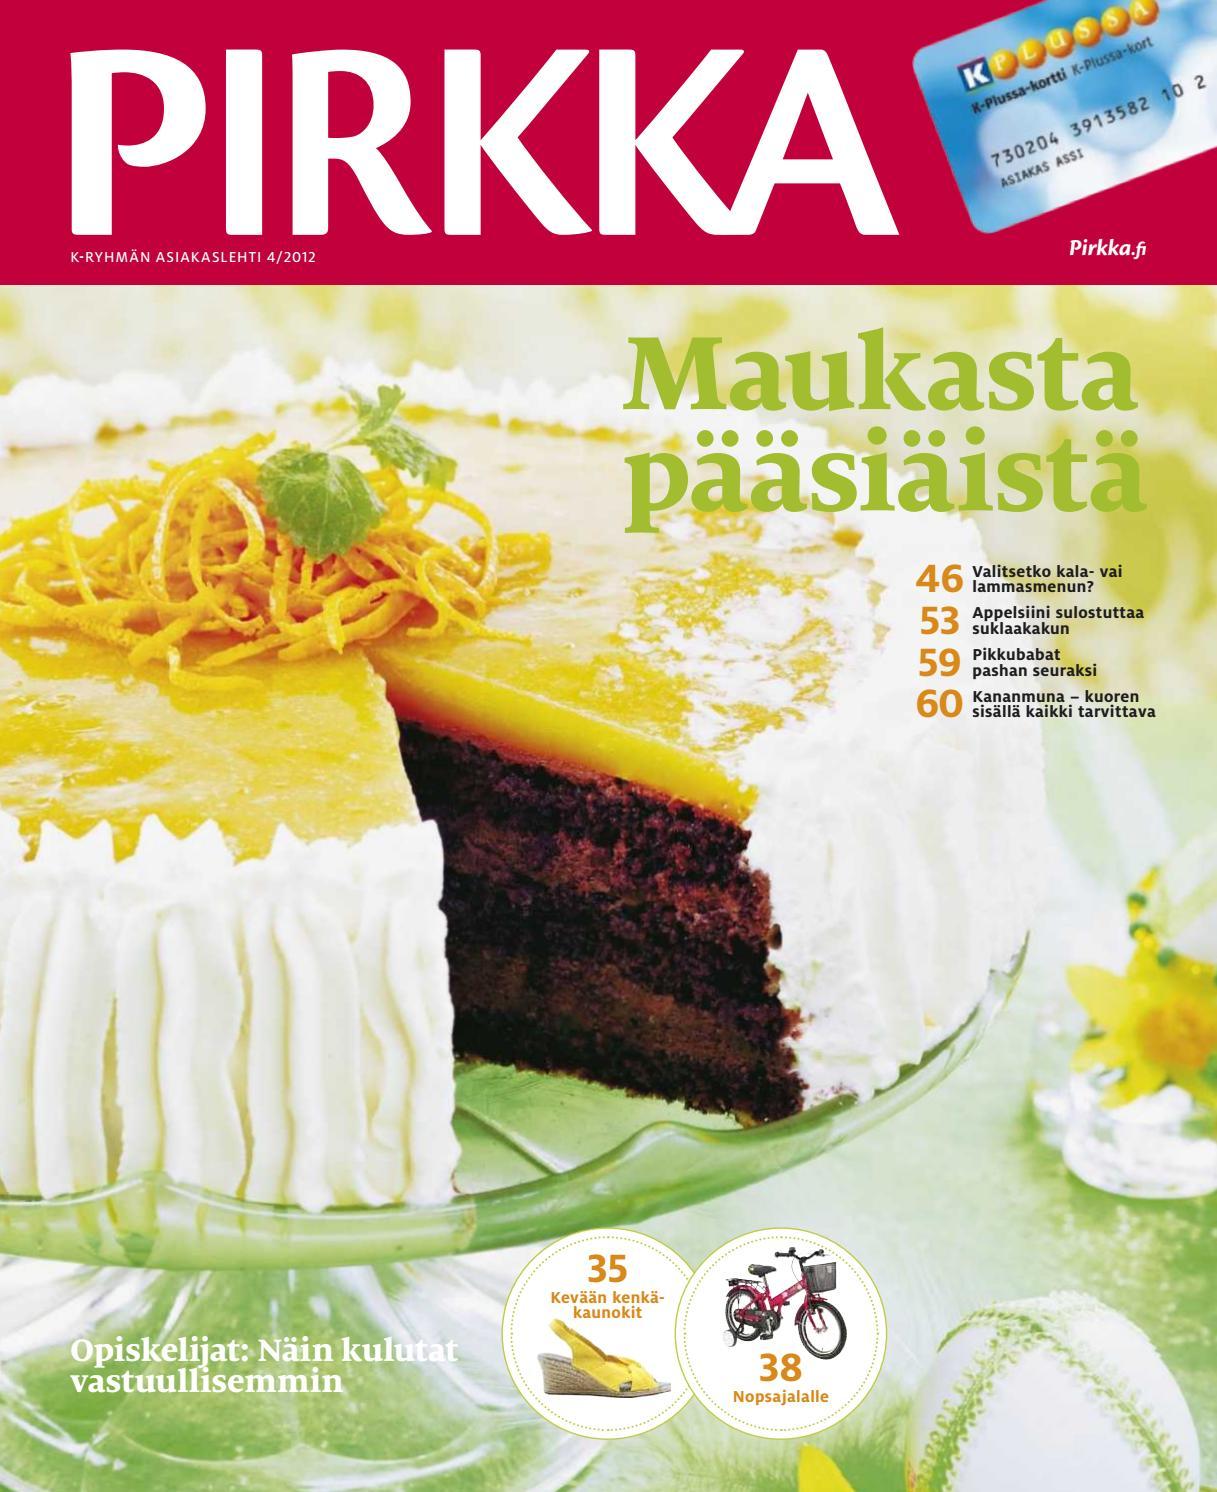 PIRKKA 4 2012 by Ruokakesko - issuu 0549ee2906